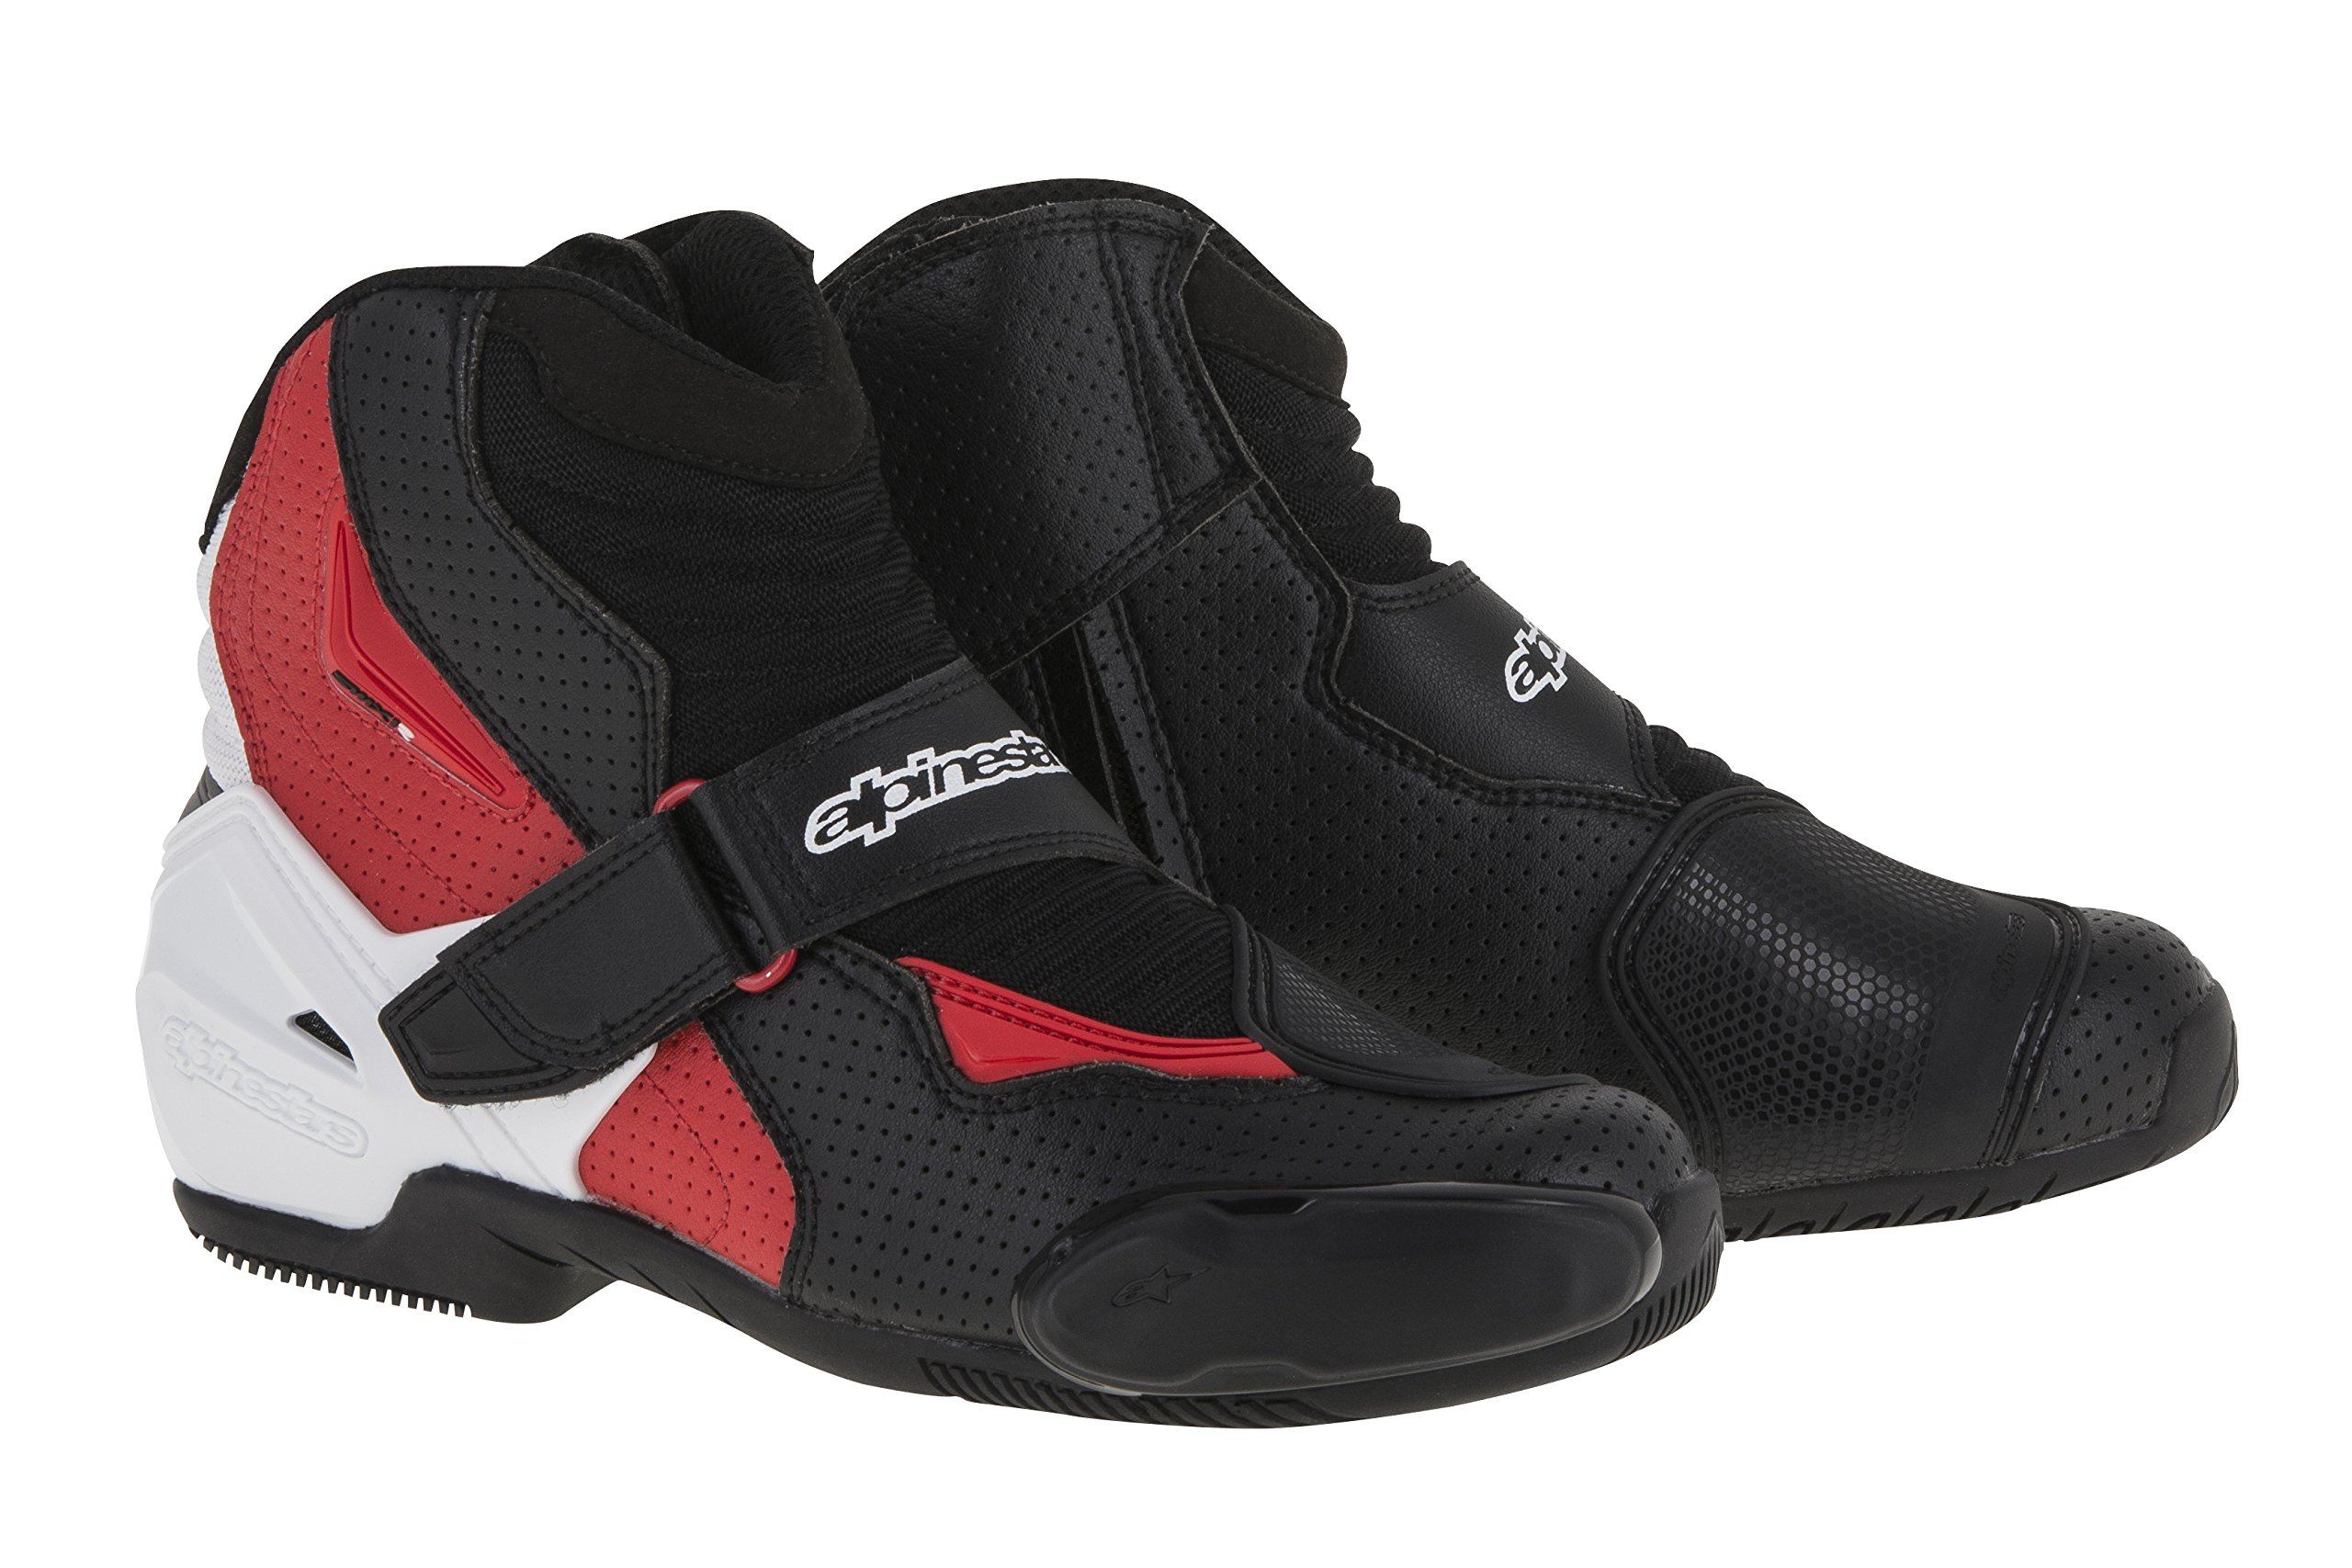 Alpinestars SMX-1 R Vented Boots (45) (Black/White/Red) by Alpinestars